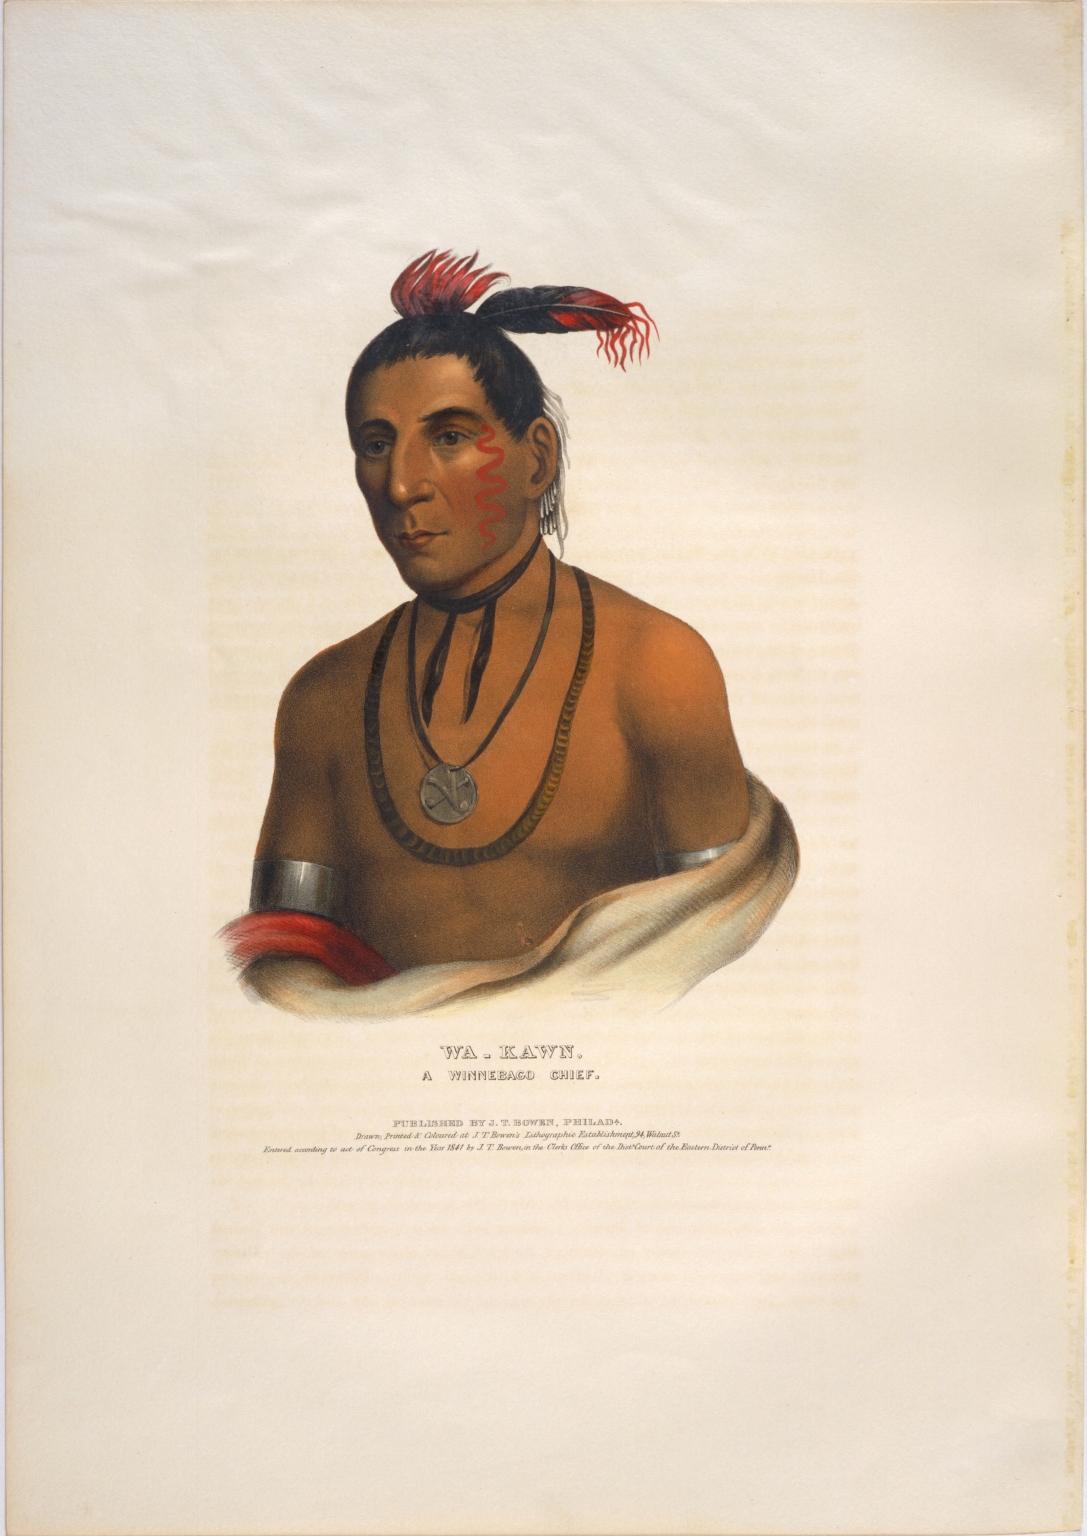 Wa-kawn, a Winnebago chief